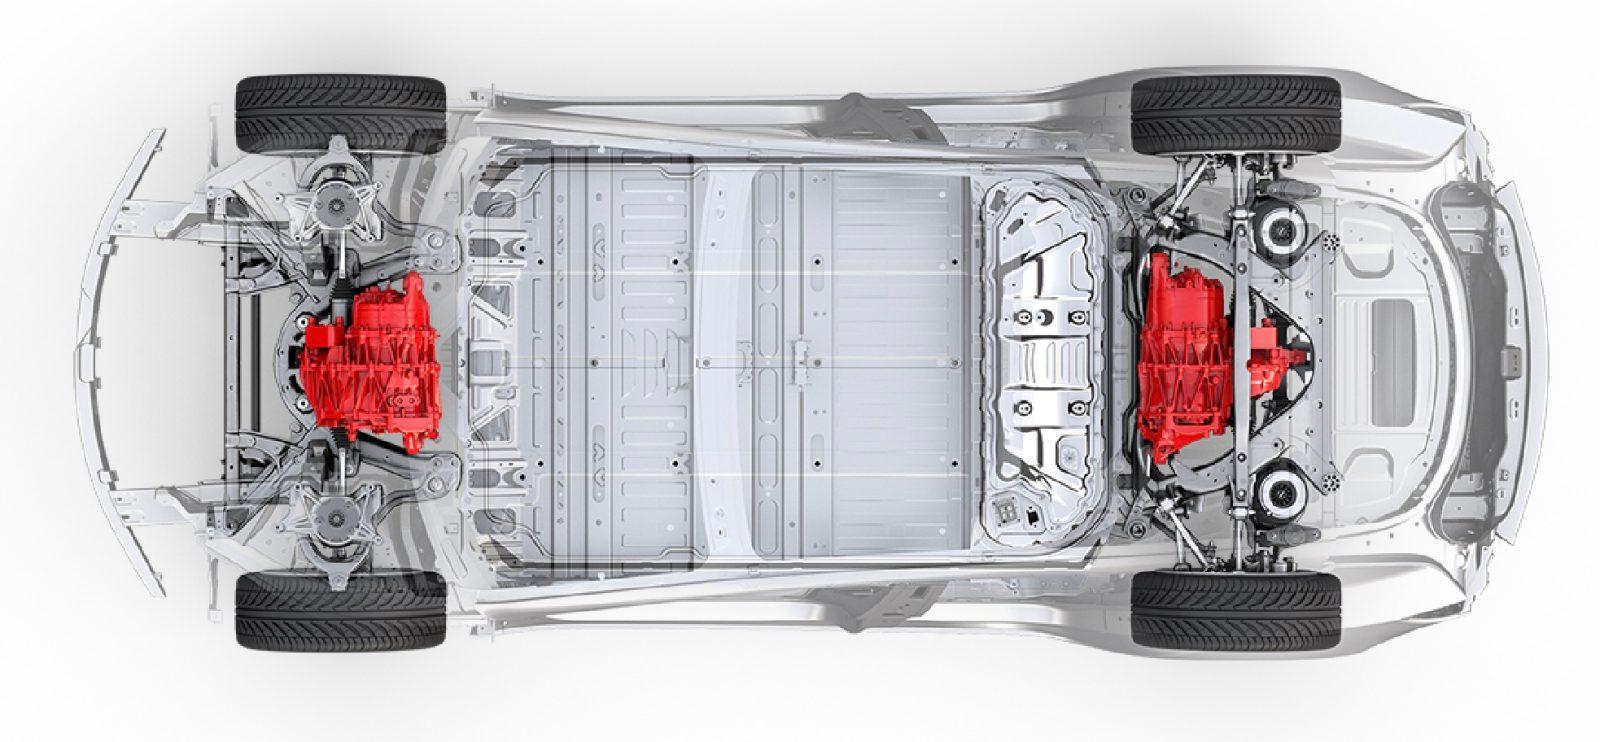 Tesla Model 3 Dual Motor Design Leaks In Latest Studio Update